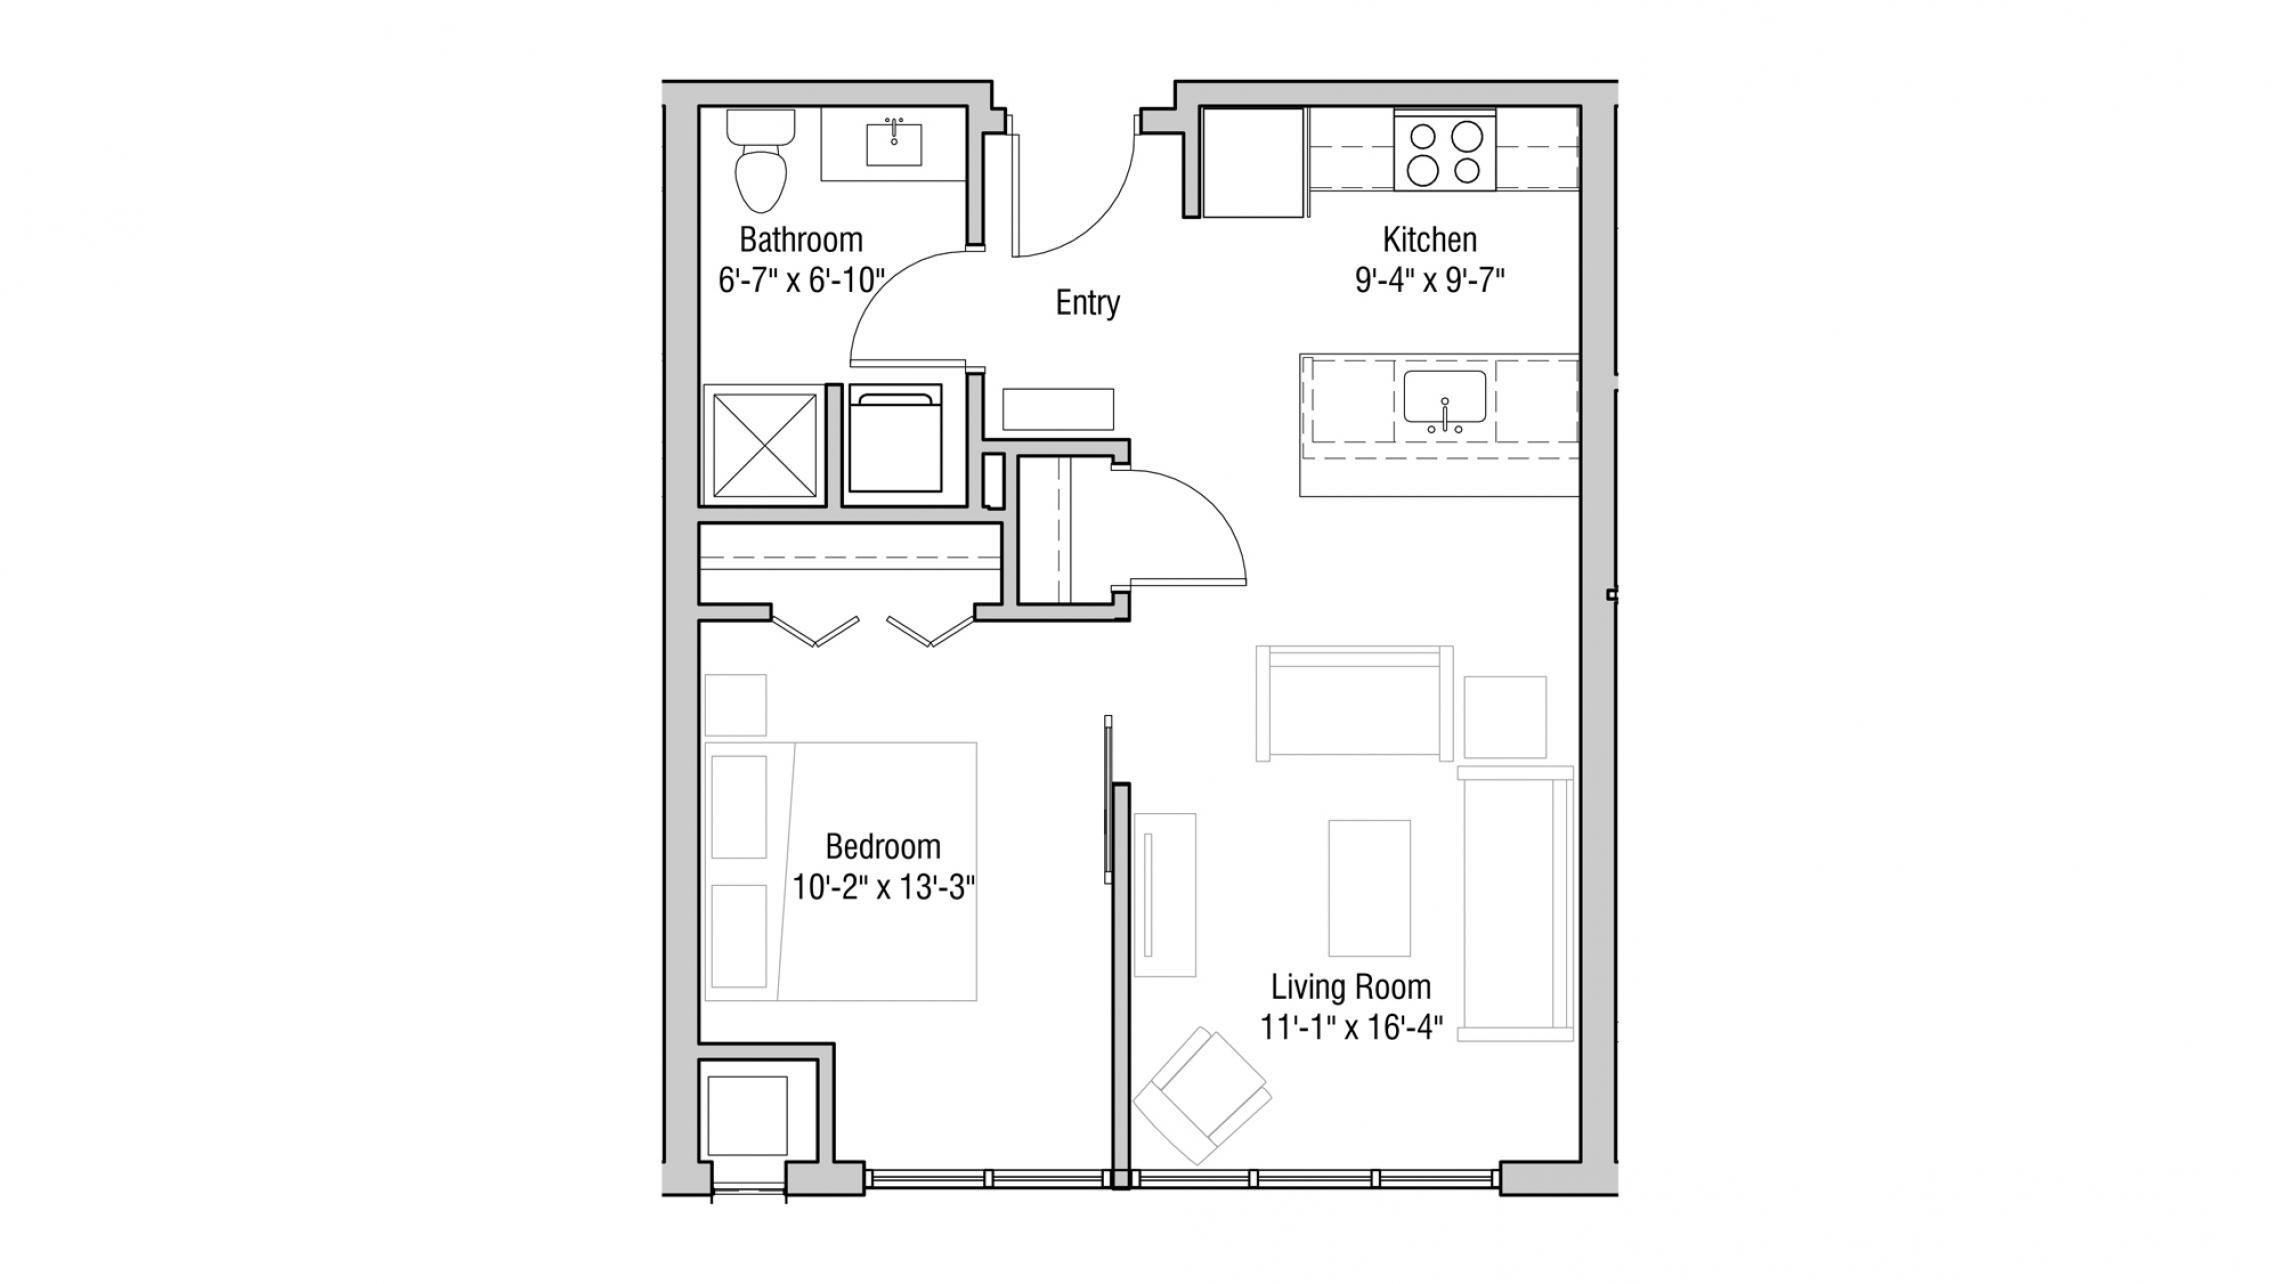 ULI Quarter Row 408 - One Bedroom, One Bathroom